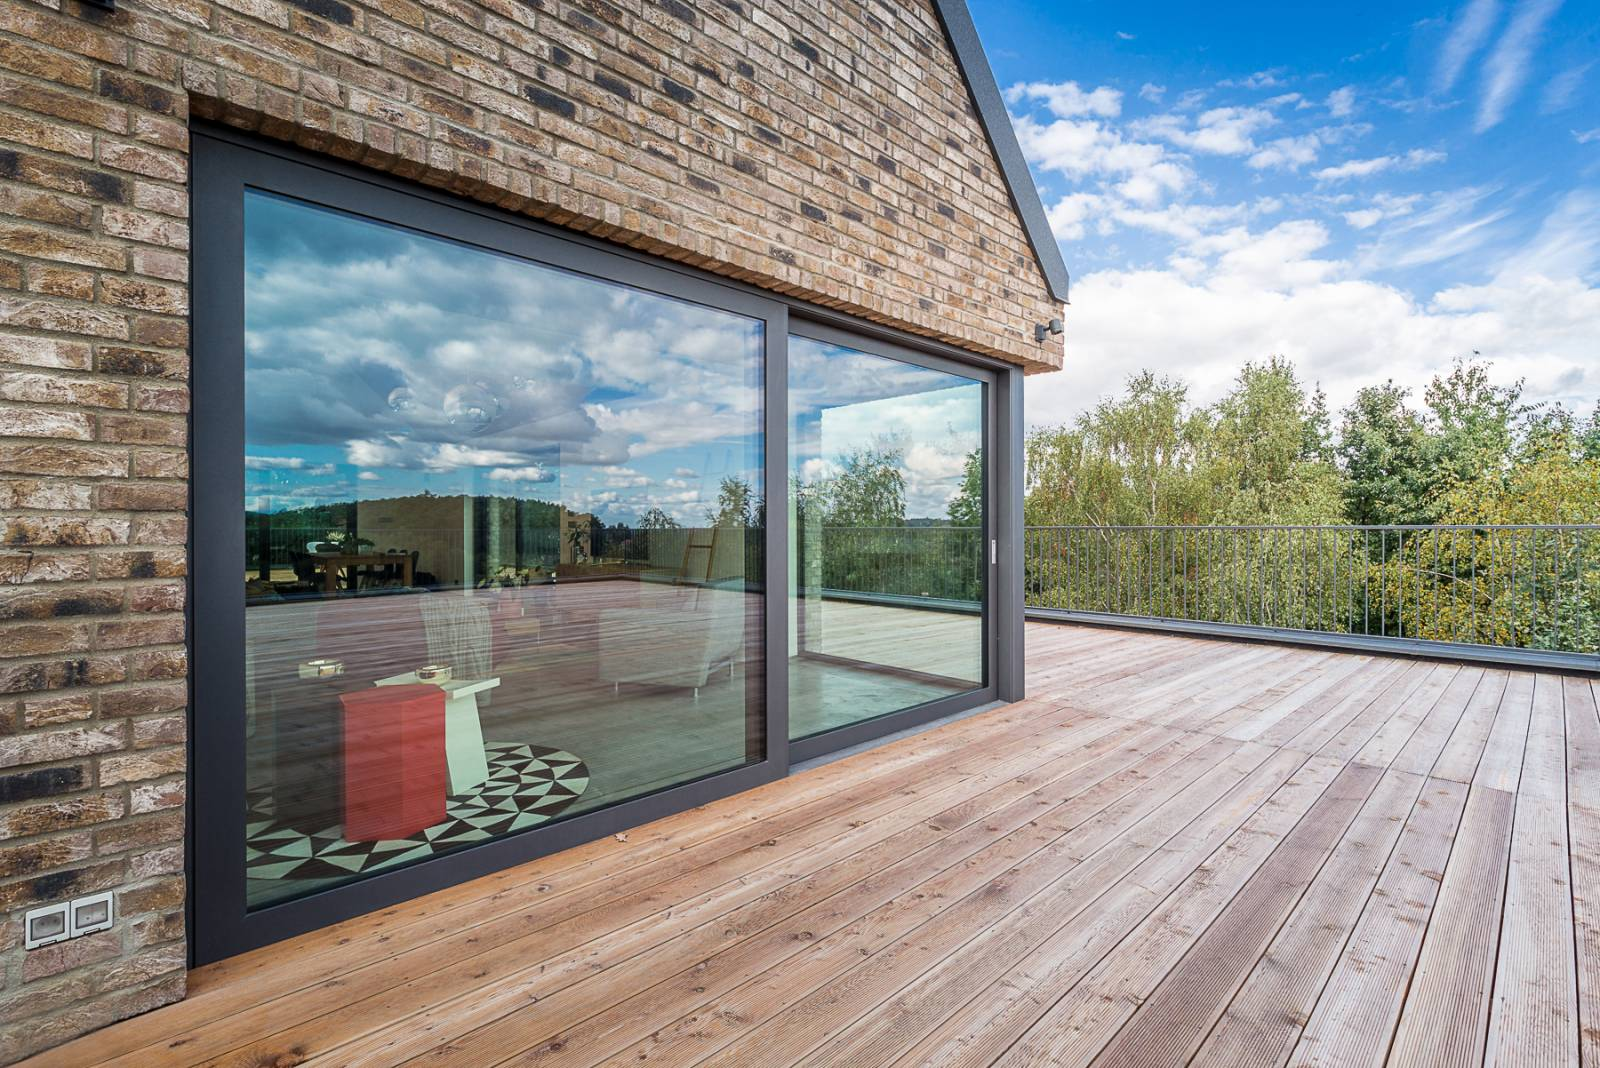 Baie vitr e d 39 angle sur aix en provence ac structures - Baie vitree d angle ...